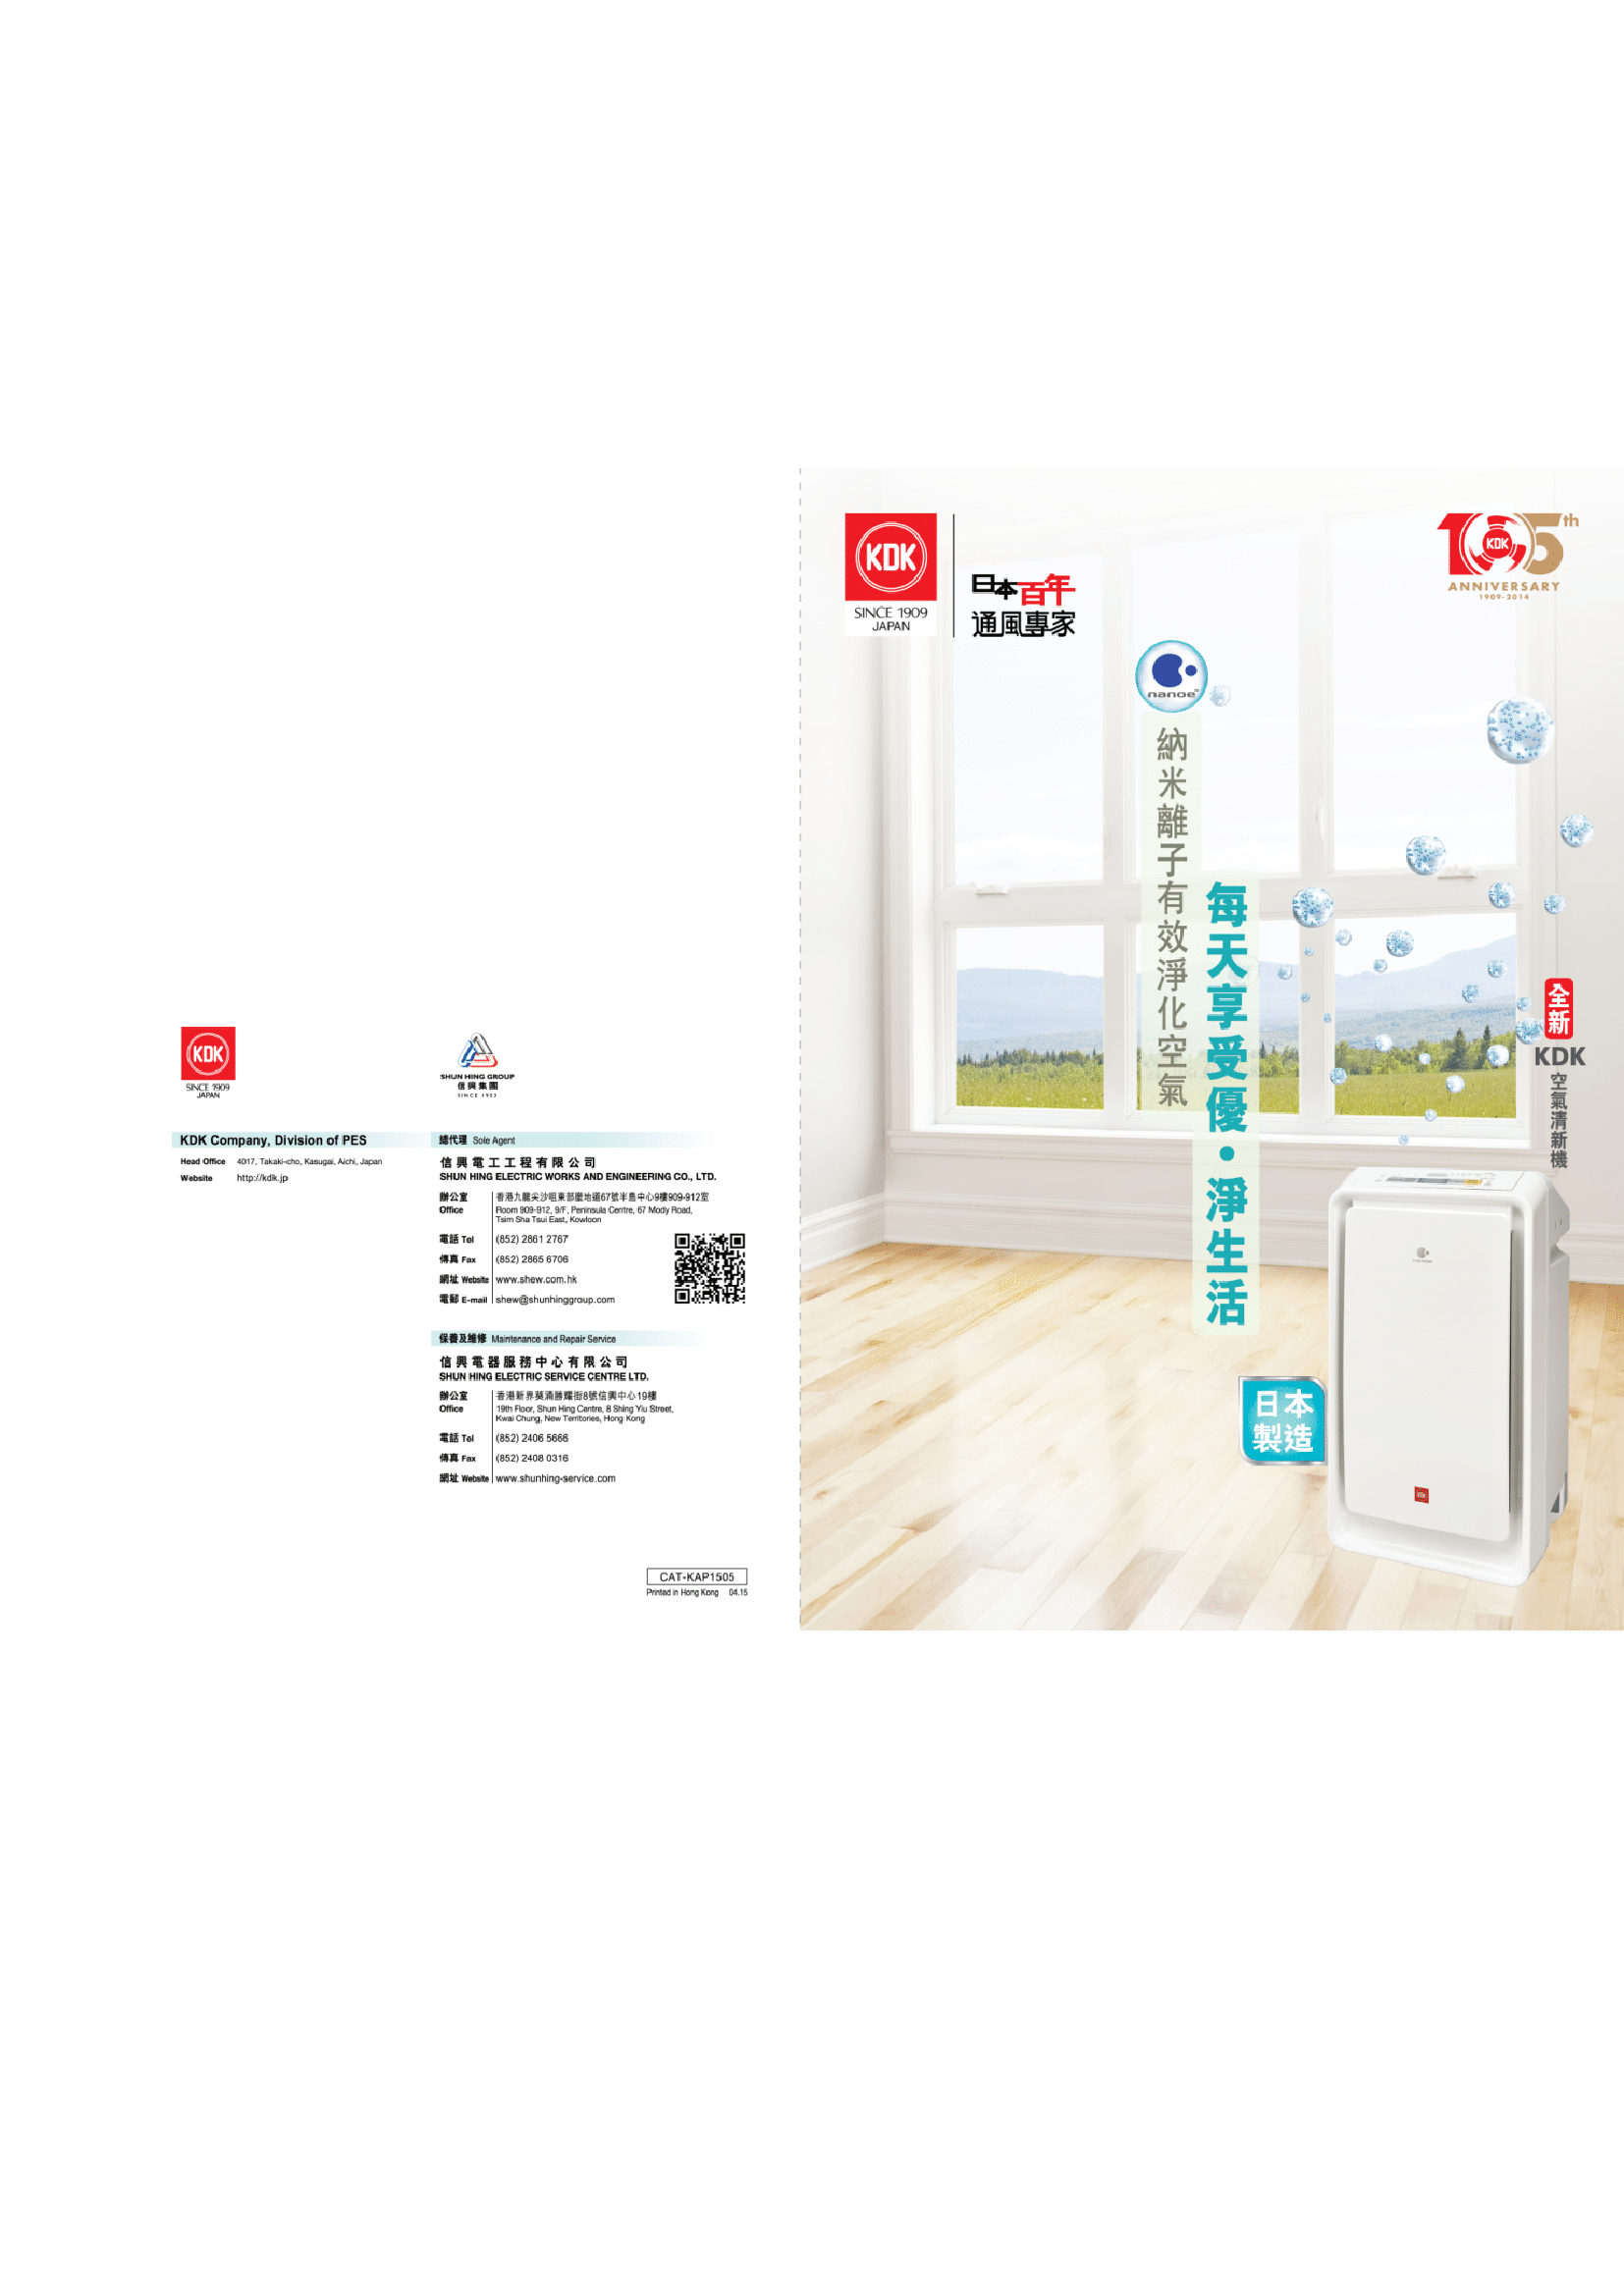 KDK Nano Air Purifier Catalogue